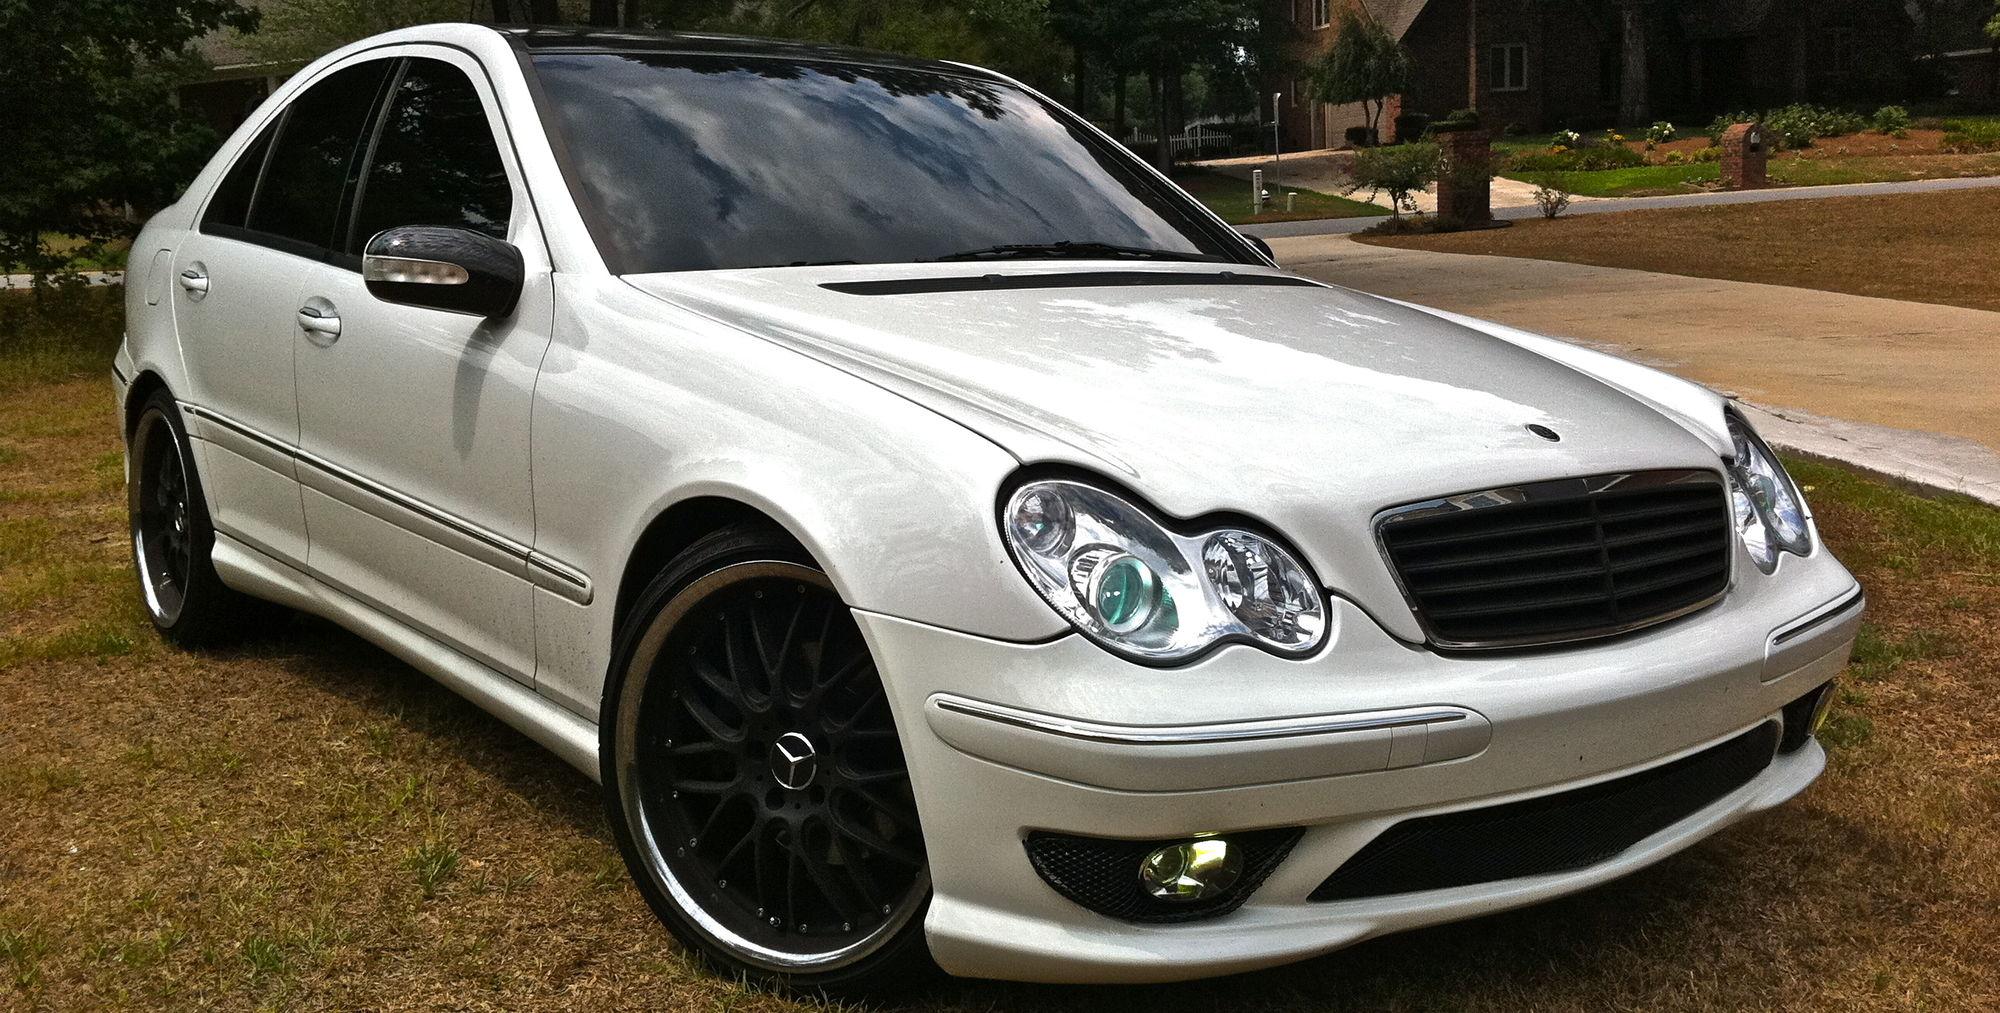 Mercedes short vin decoder autos post for Mercedes benz vin numbers